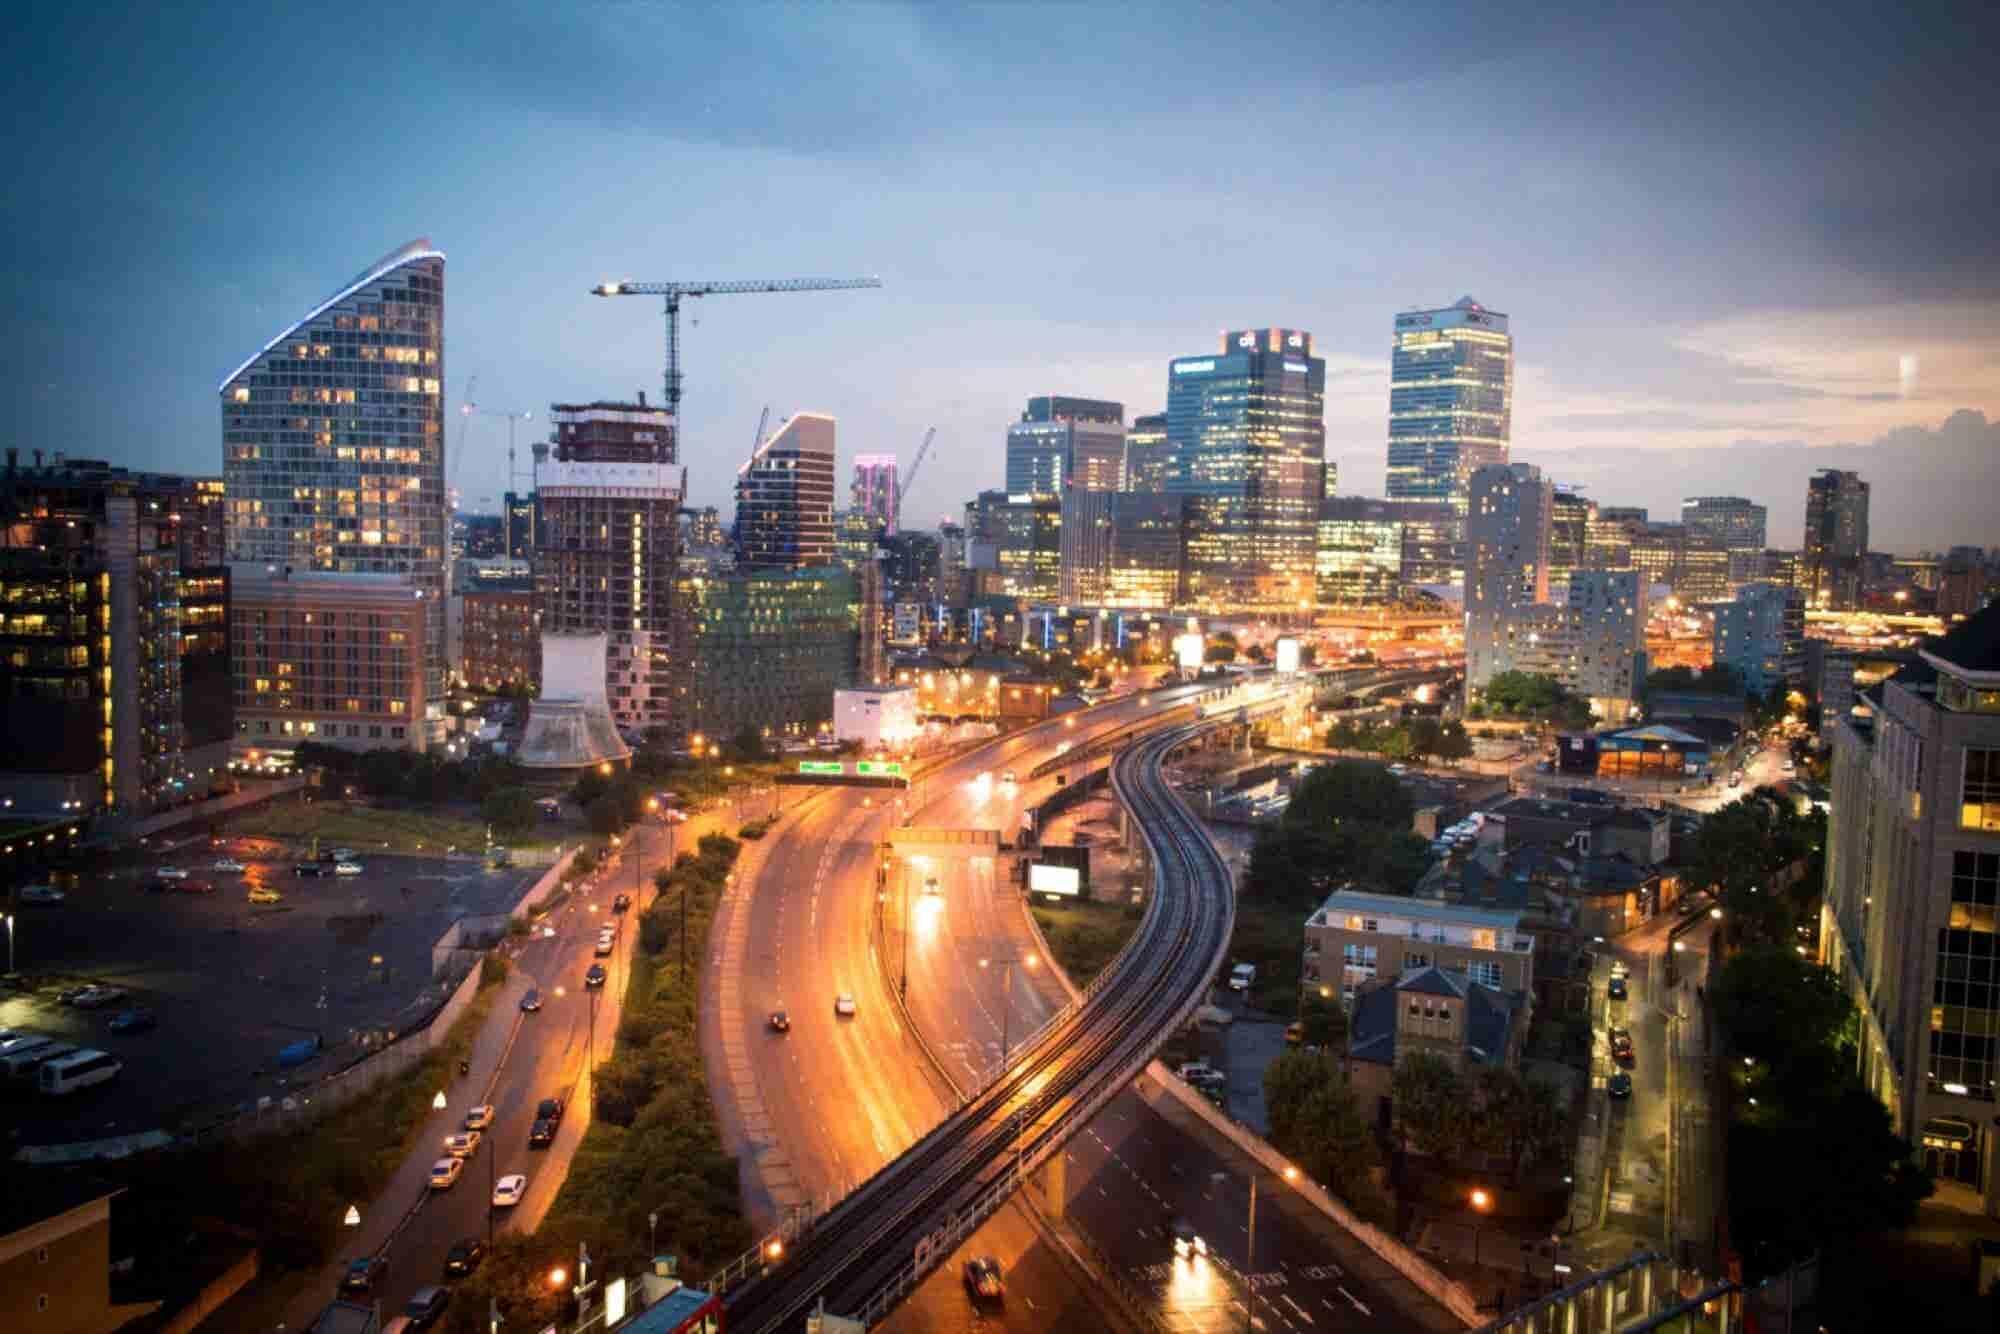 Digitization Steering Smart Cities